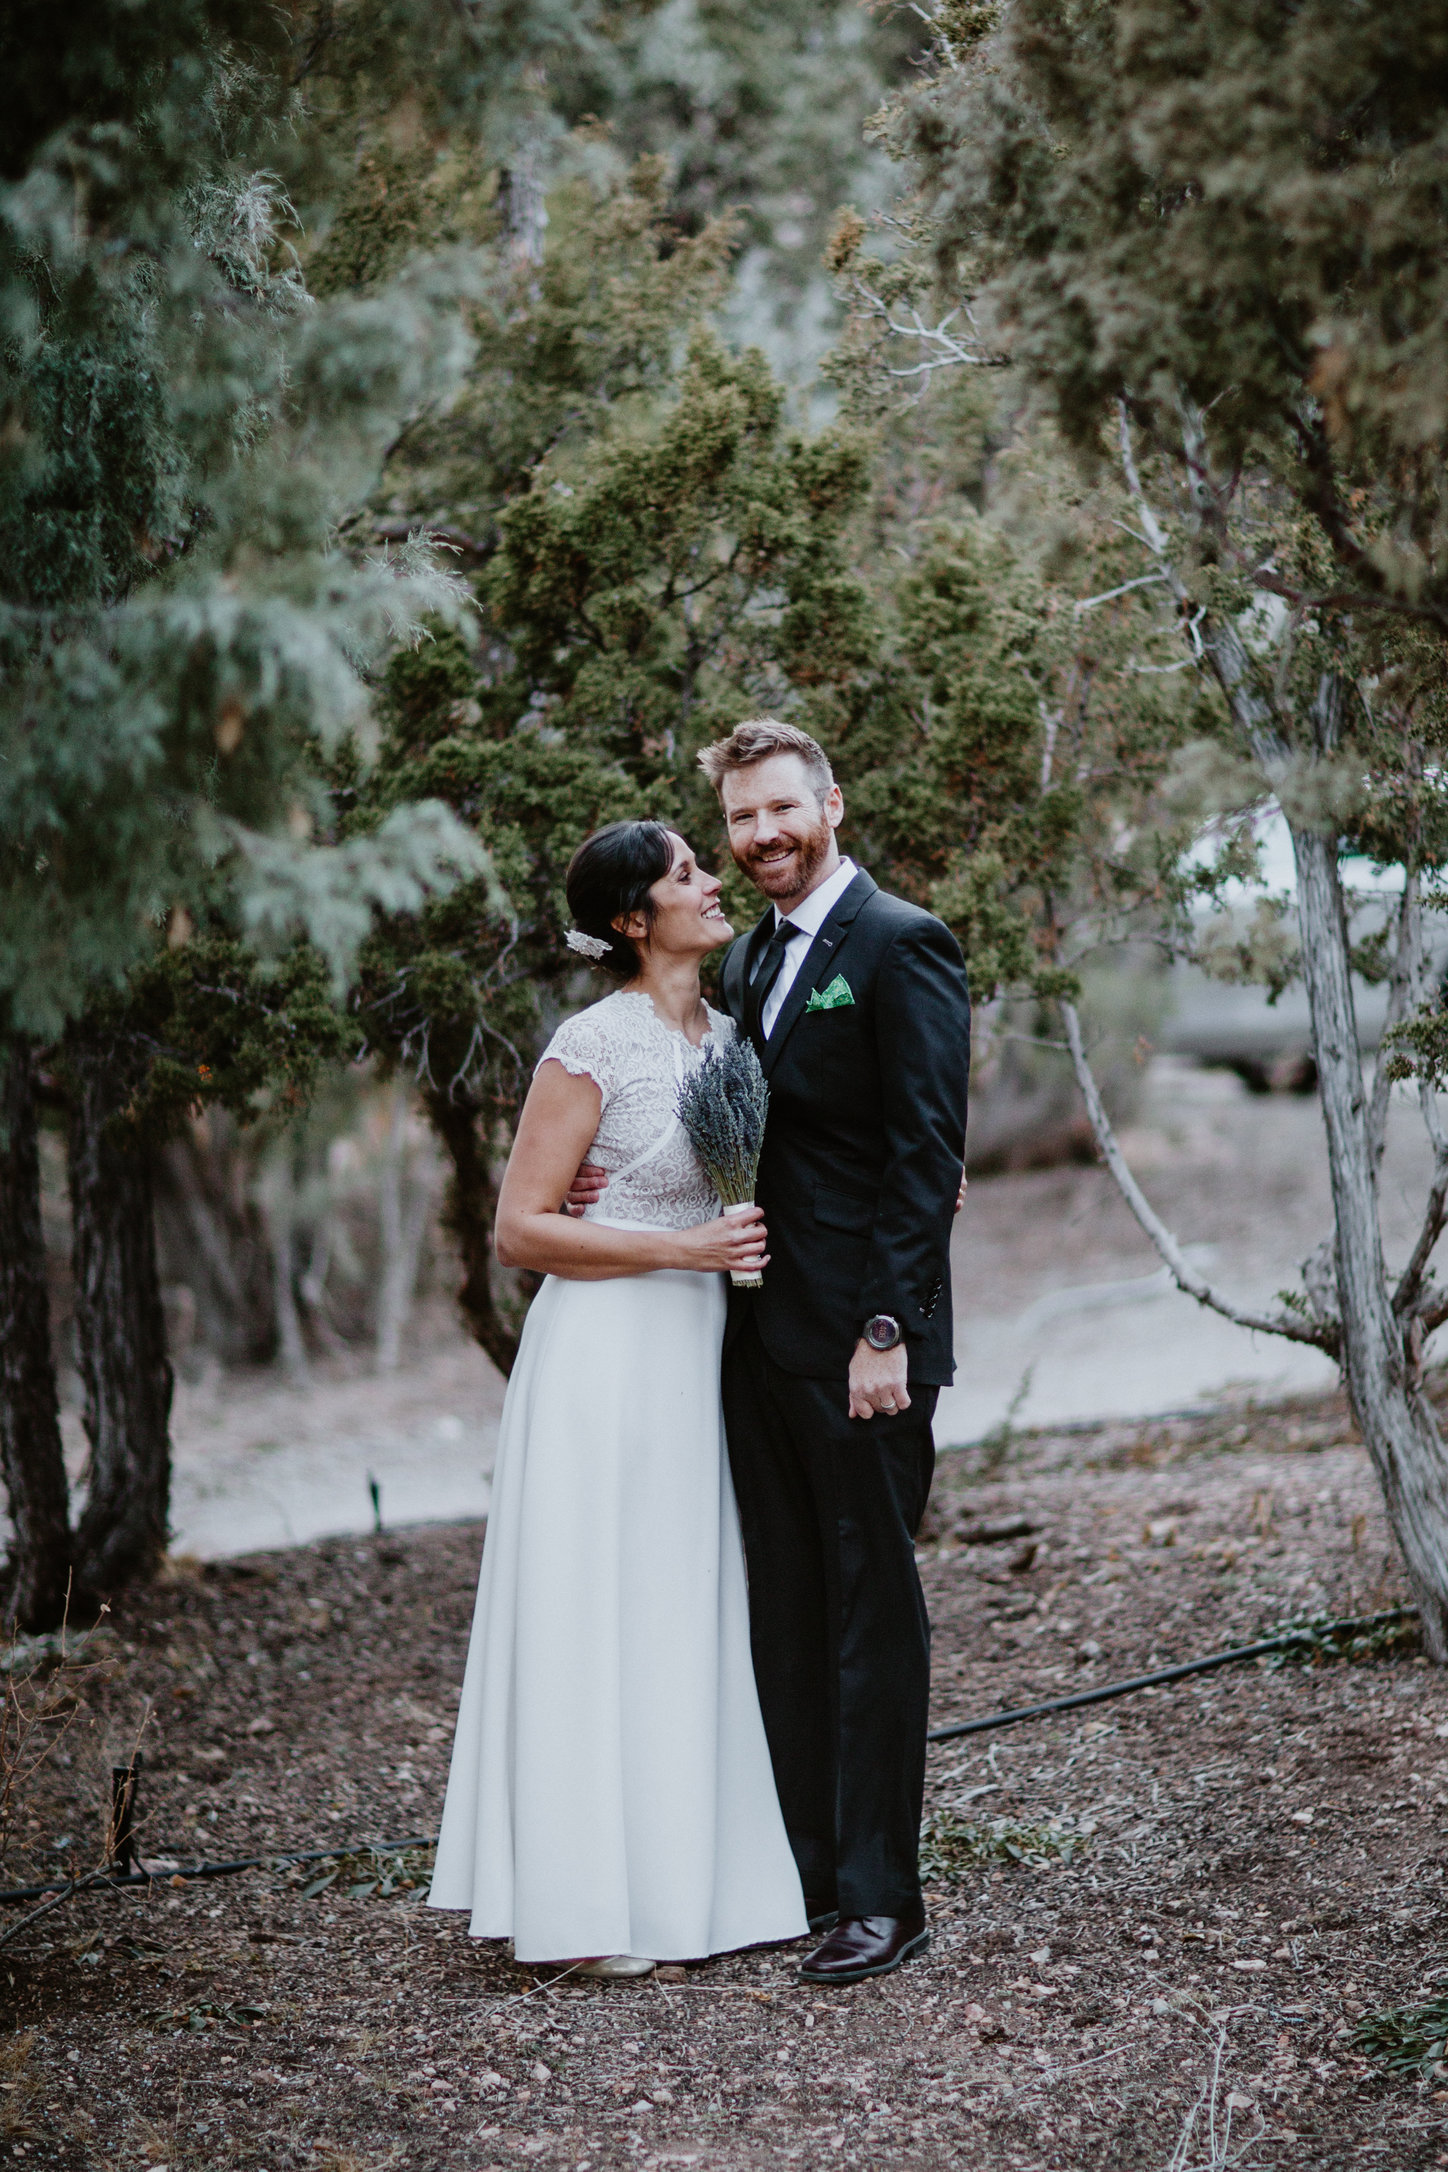 HandM-wedding-148.jpg